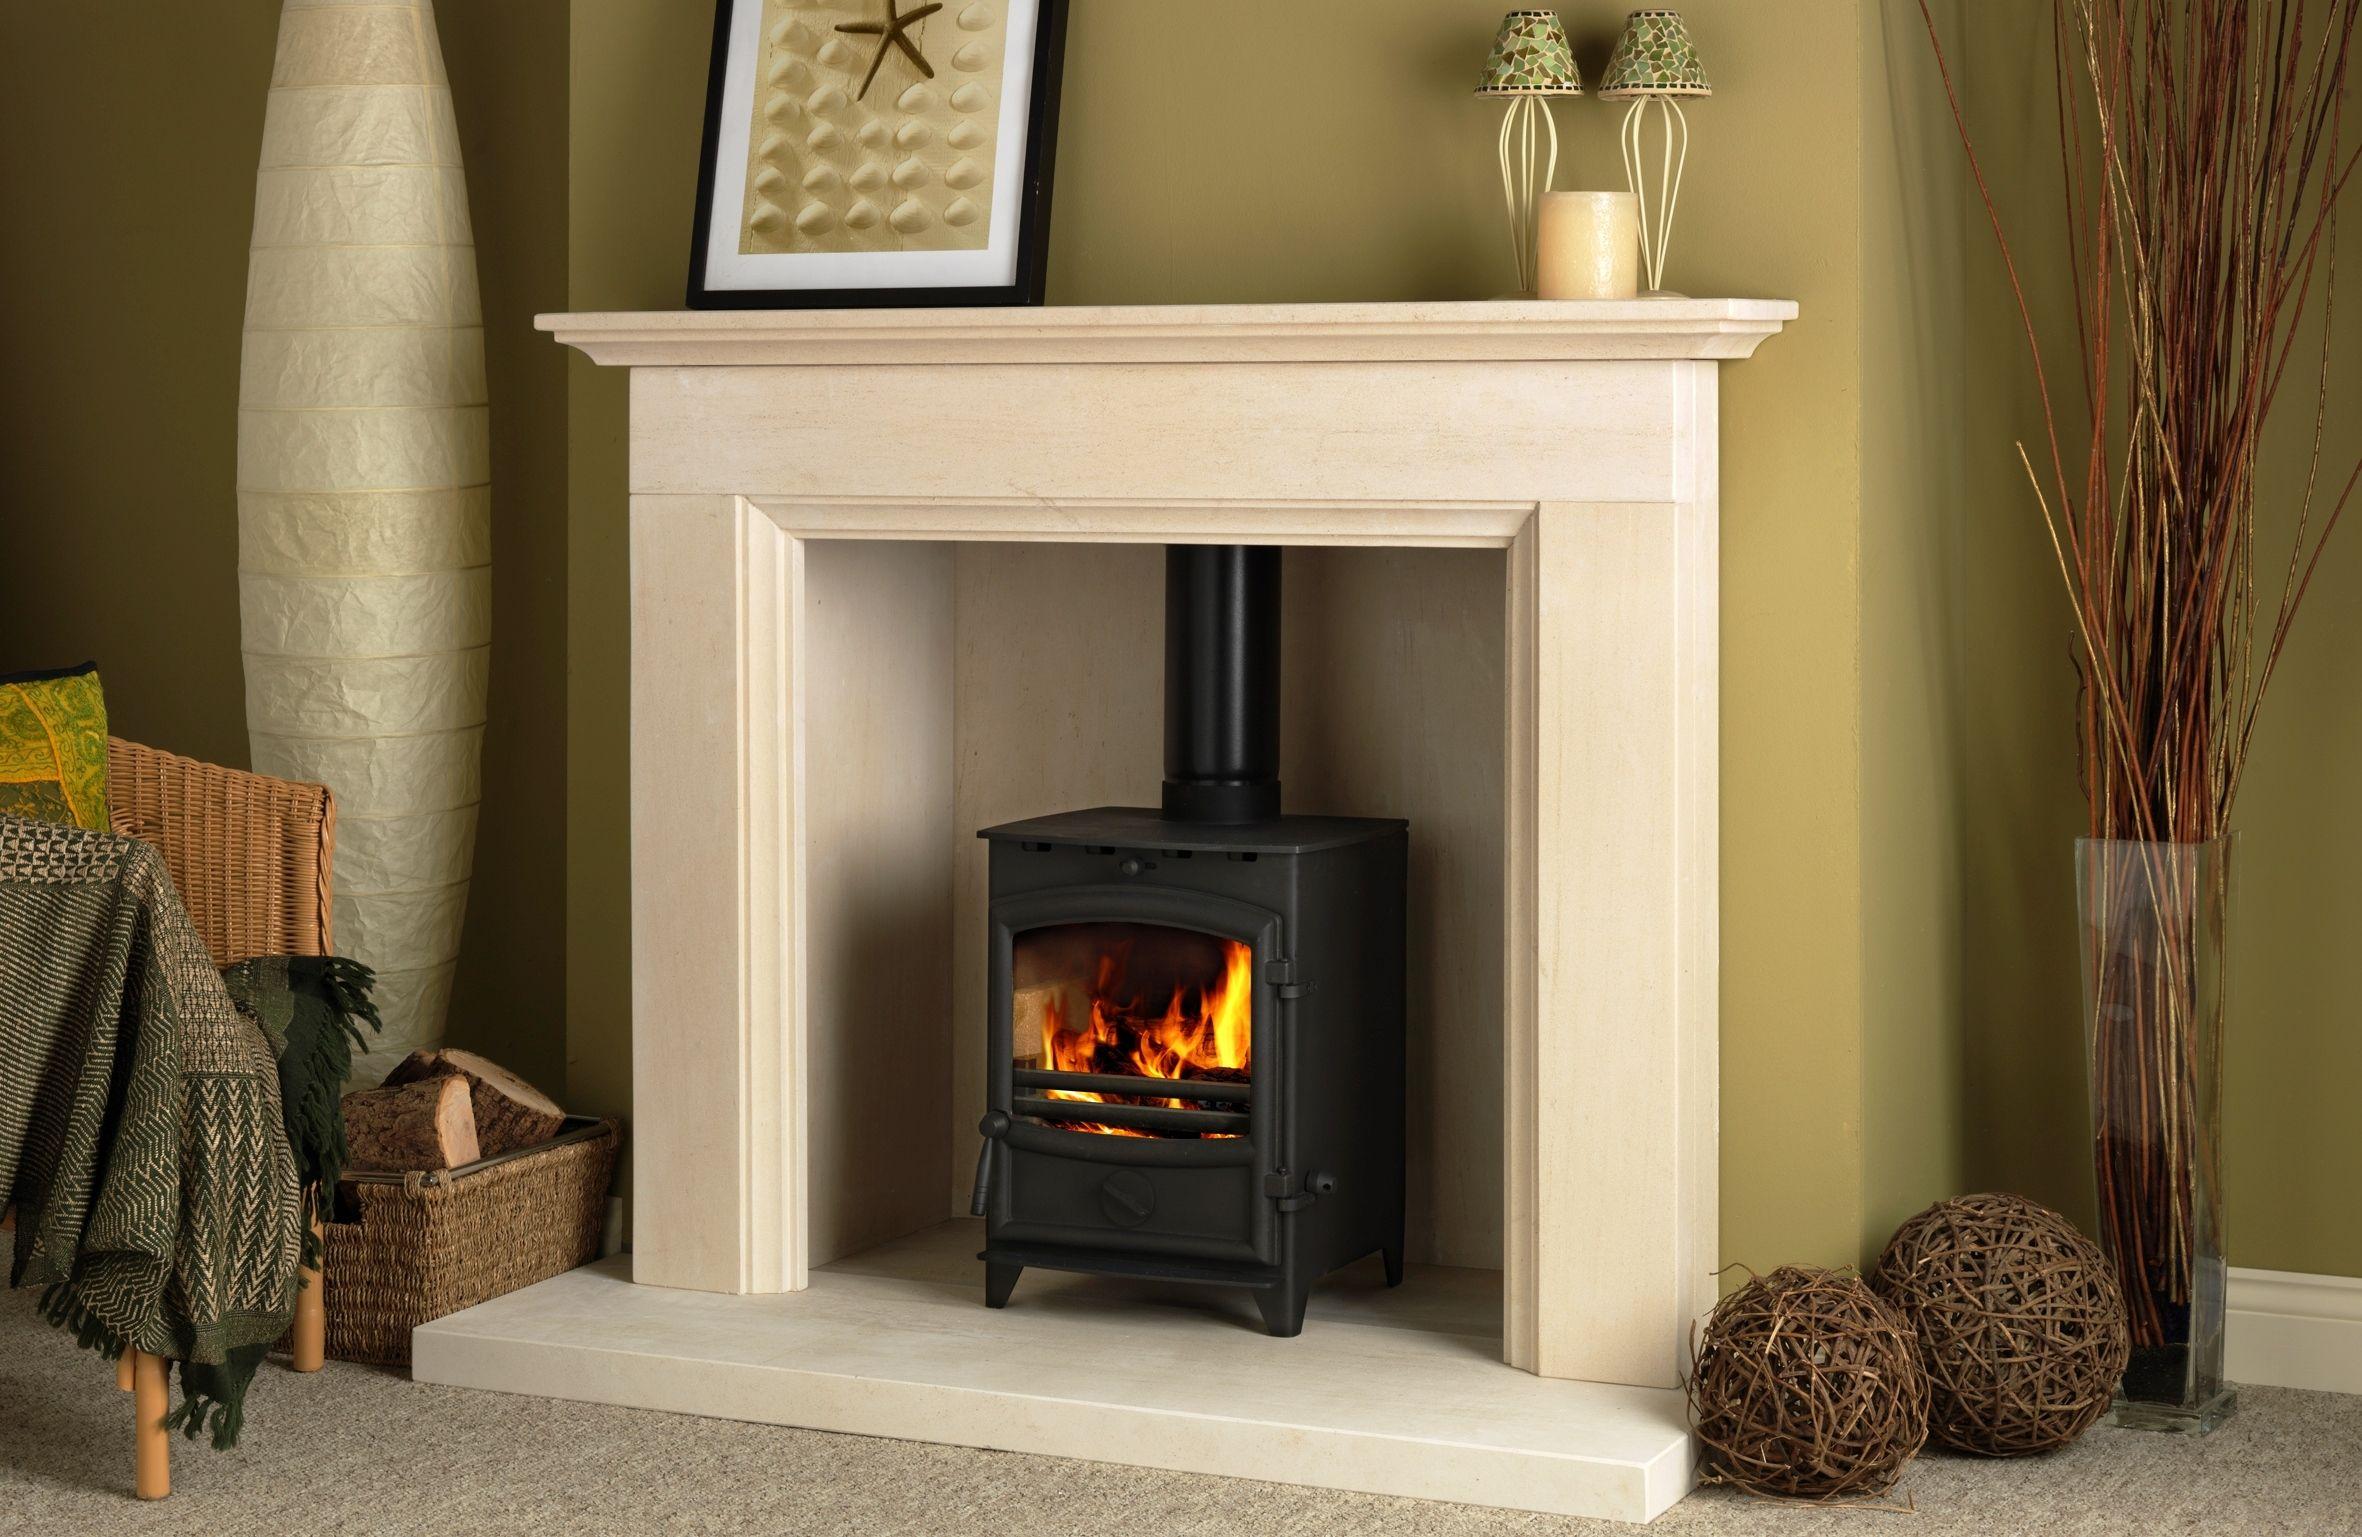 Interior Beautiful Black Wood Burning Fireplace Design Idea White